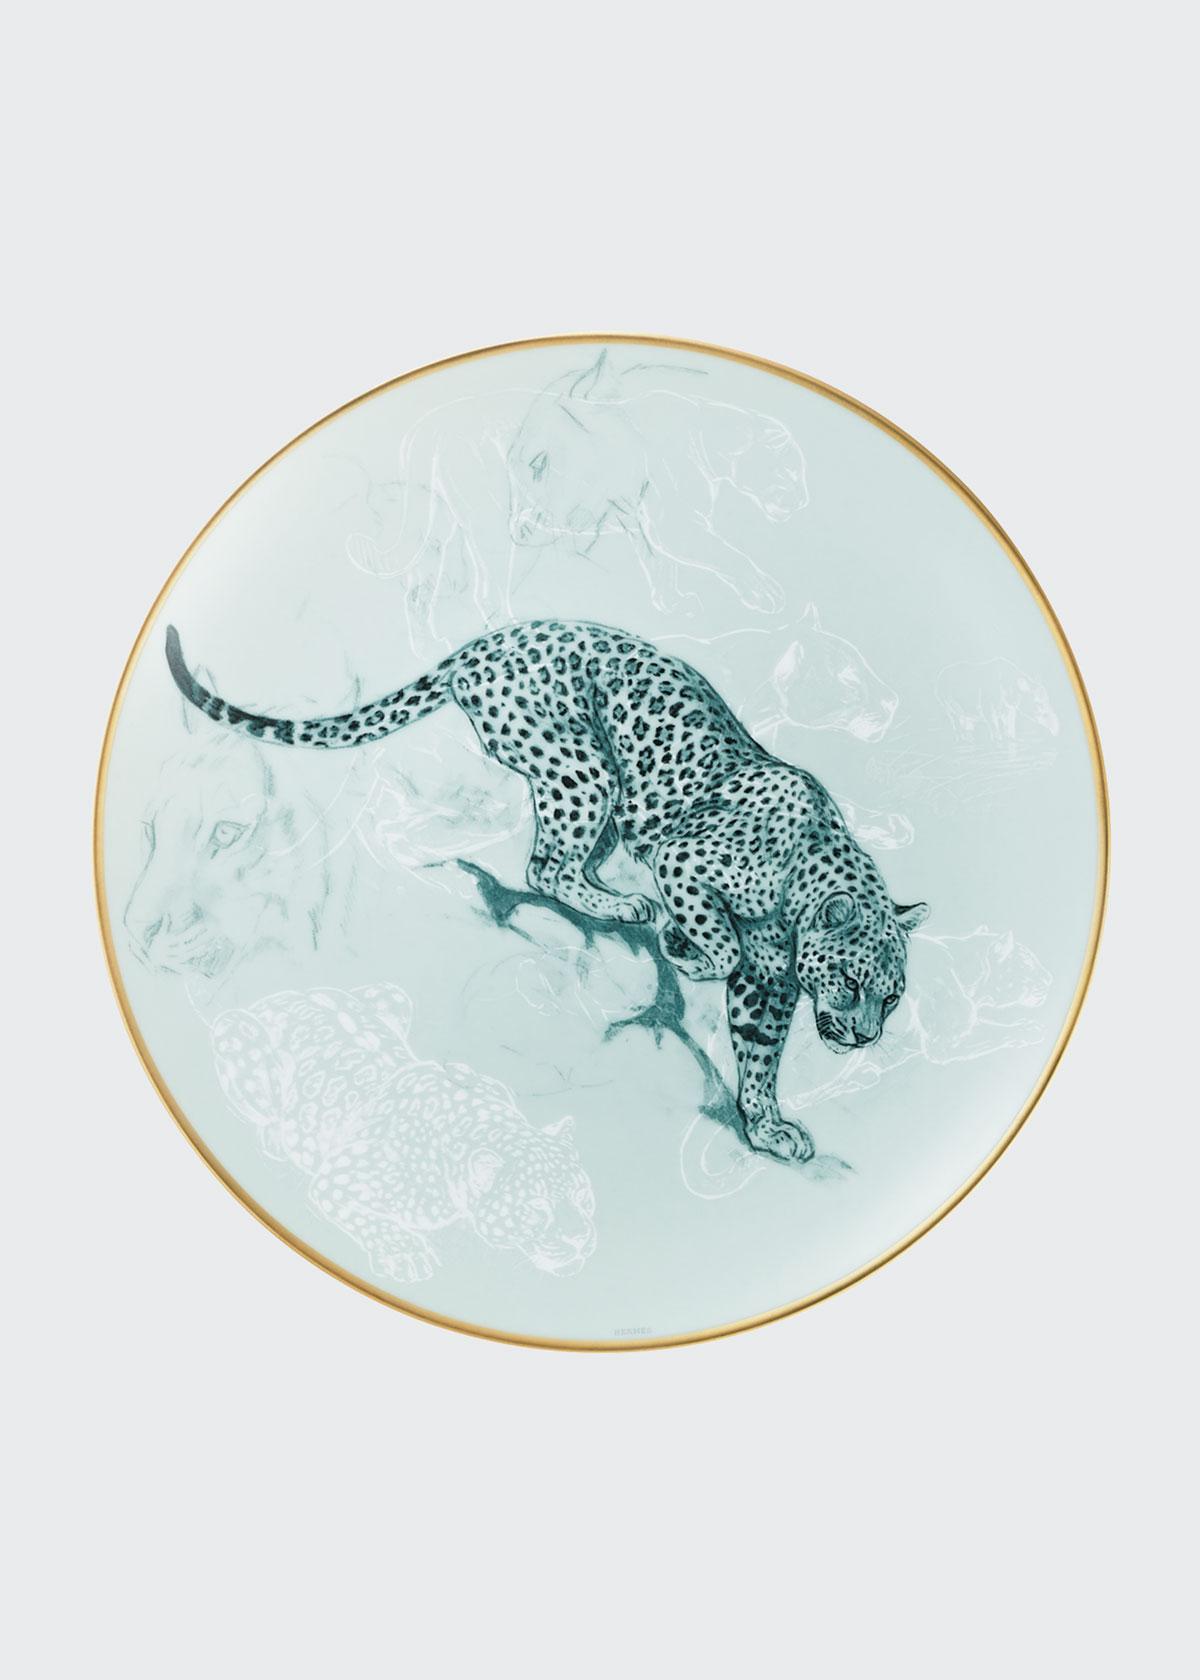 Herm S Dinnerwares CARNETS D'EQUATEUR PANTHER SALAD PLATE